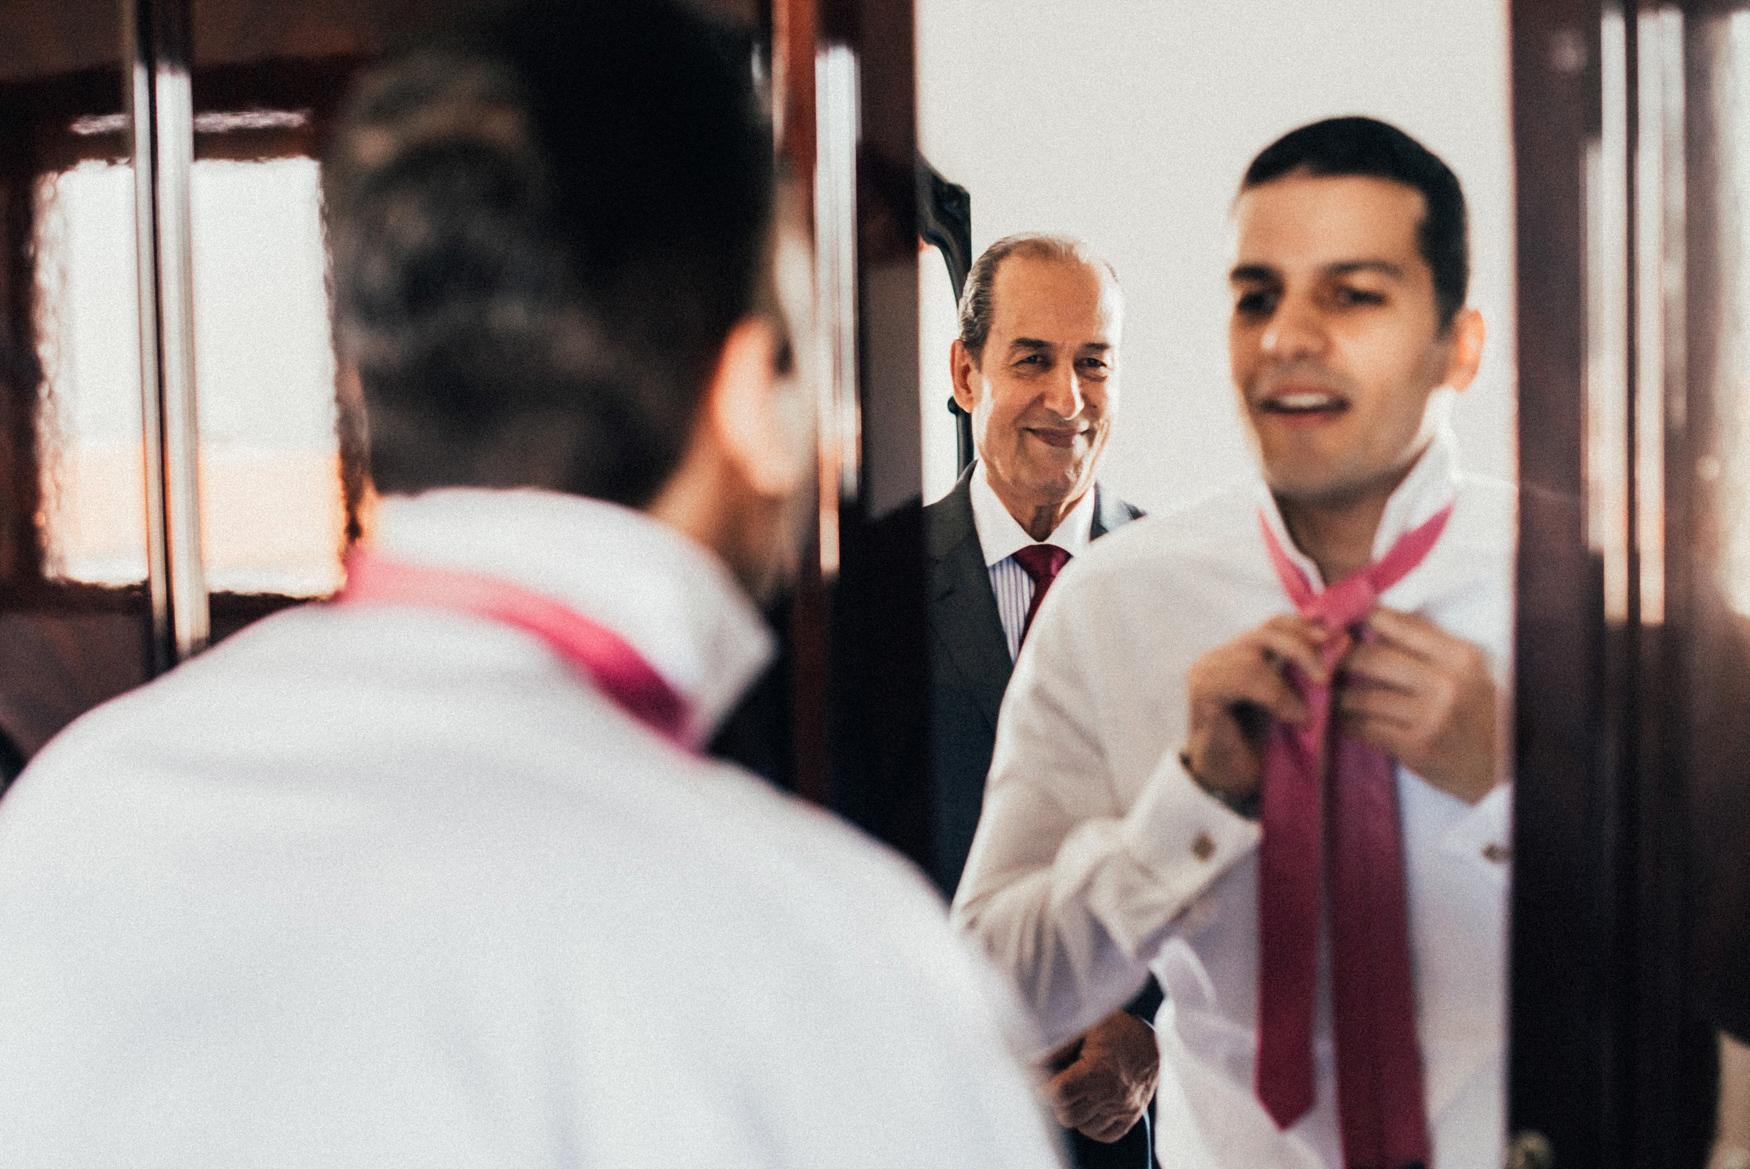 LR2 beirut byblos wedding photographer lebanon 008.jpg